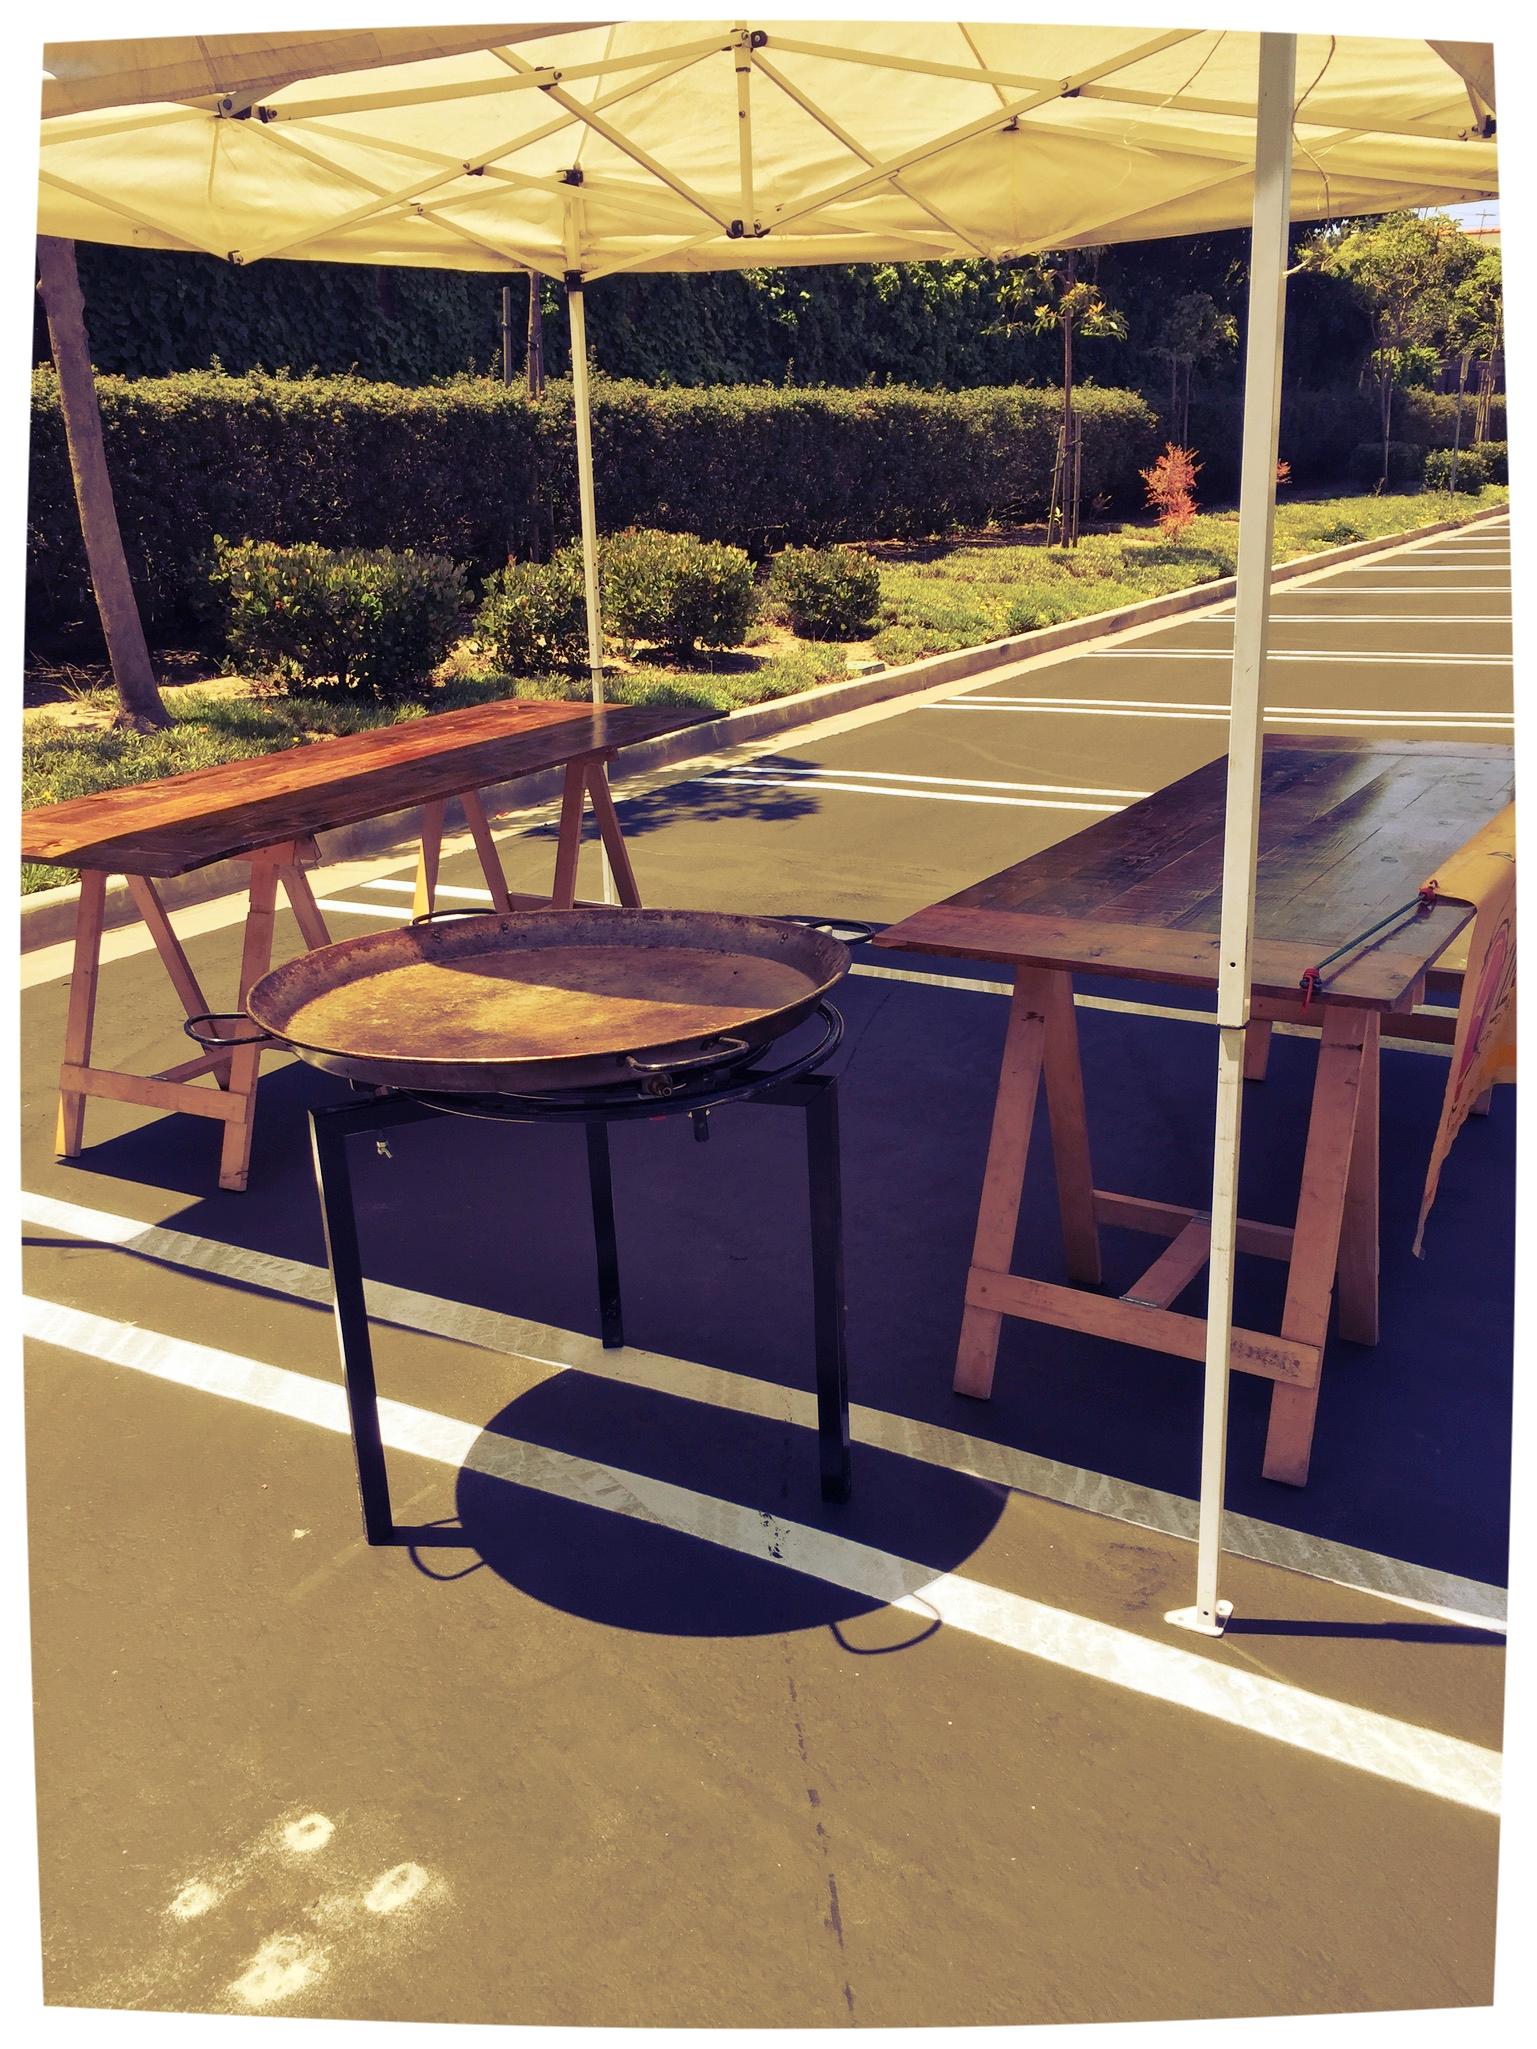 bomba-paella-catering -layout-4.jpg